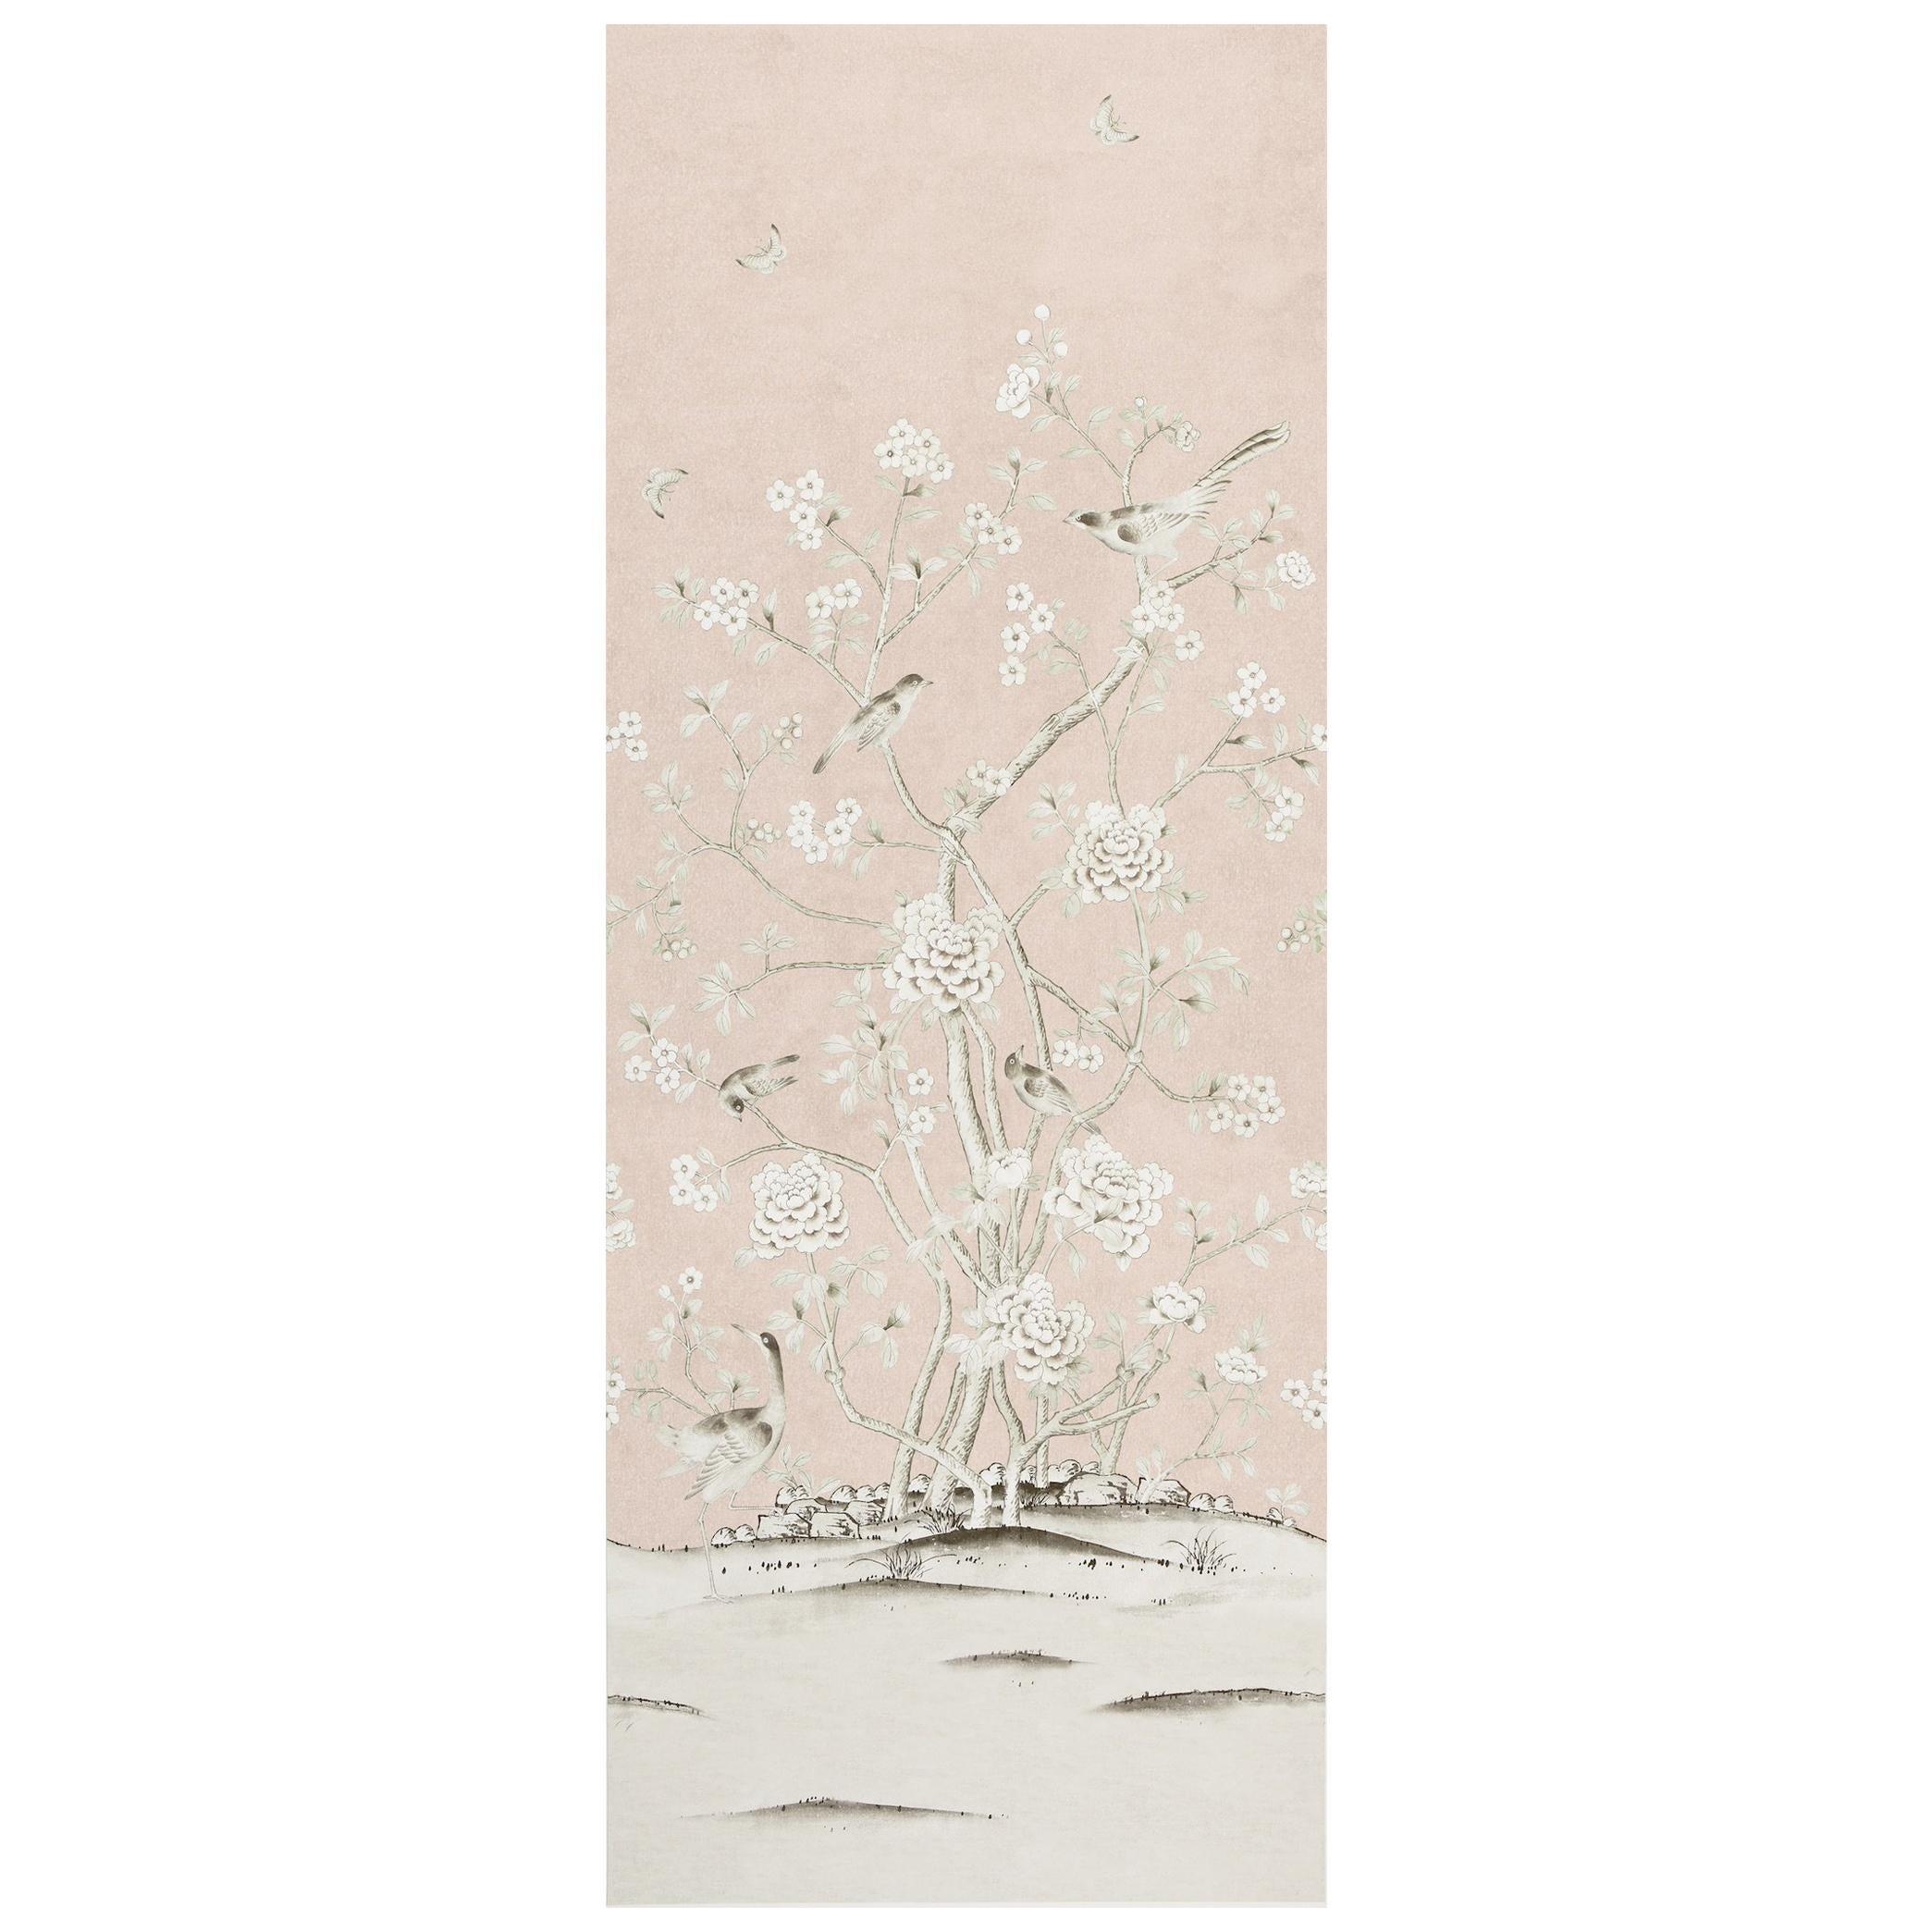 Schumacher Mary McDonald Chinois Palais Floral Blush Conch Wallpaper Panel